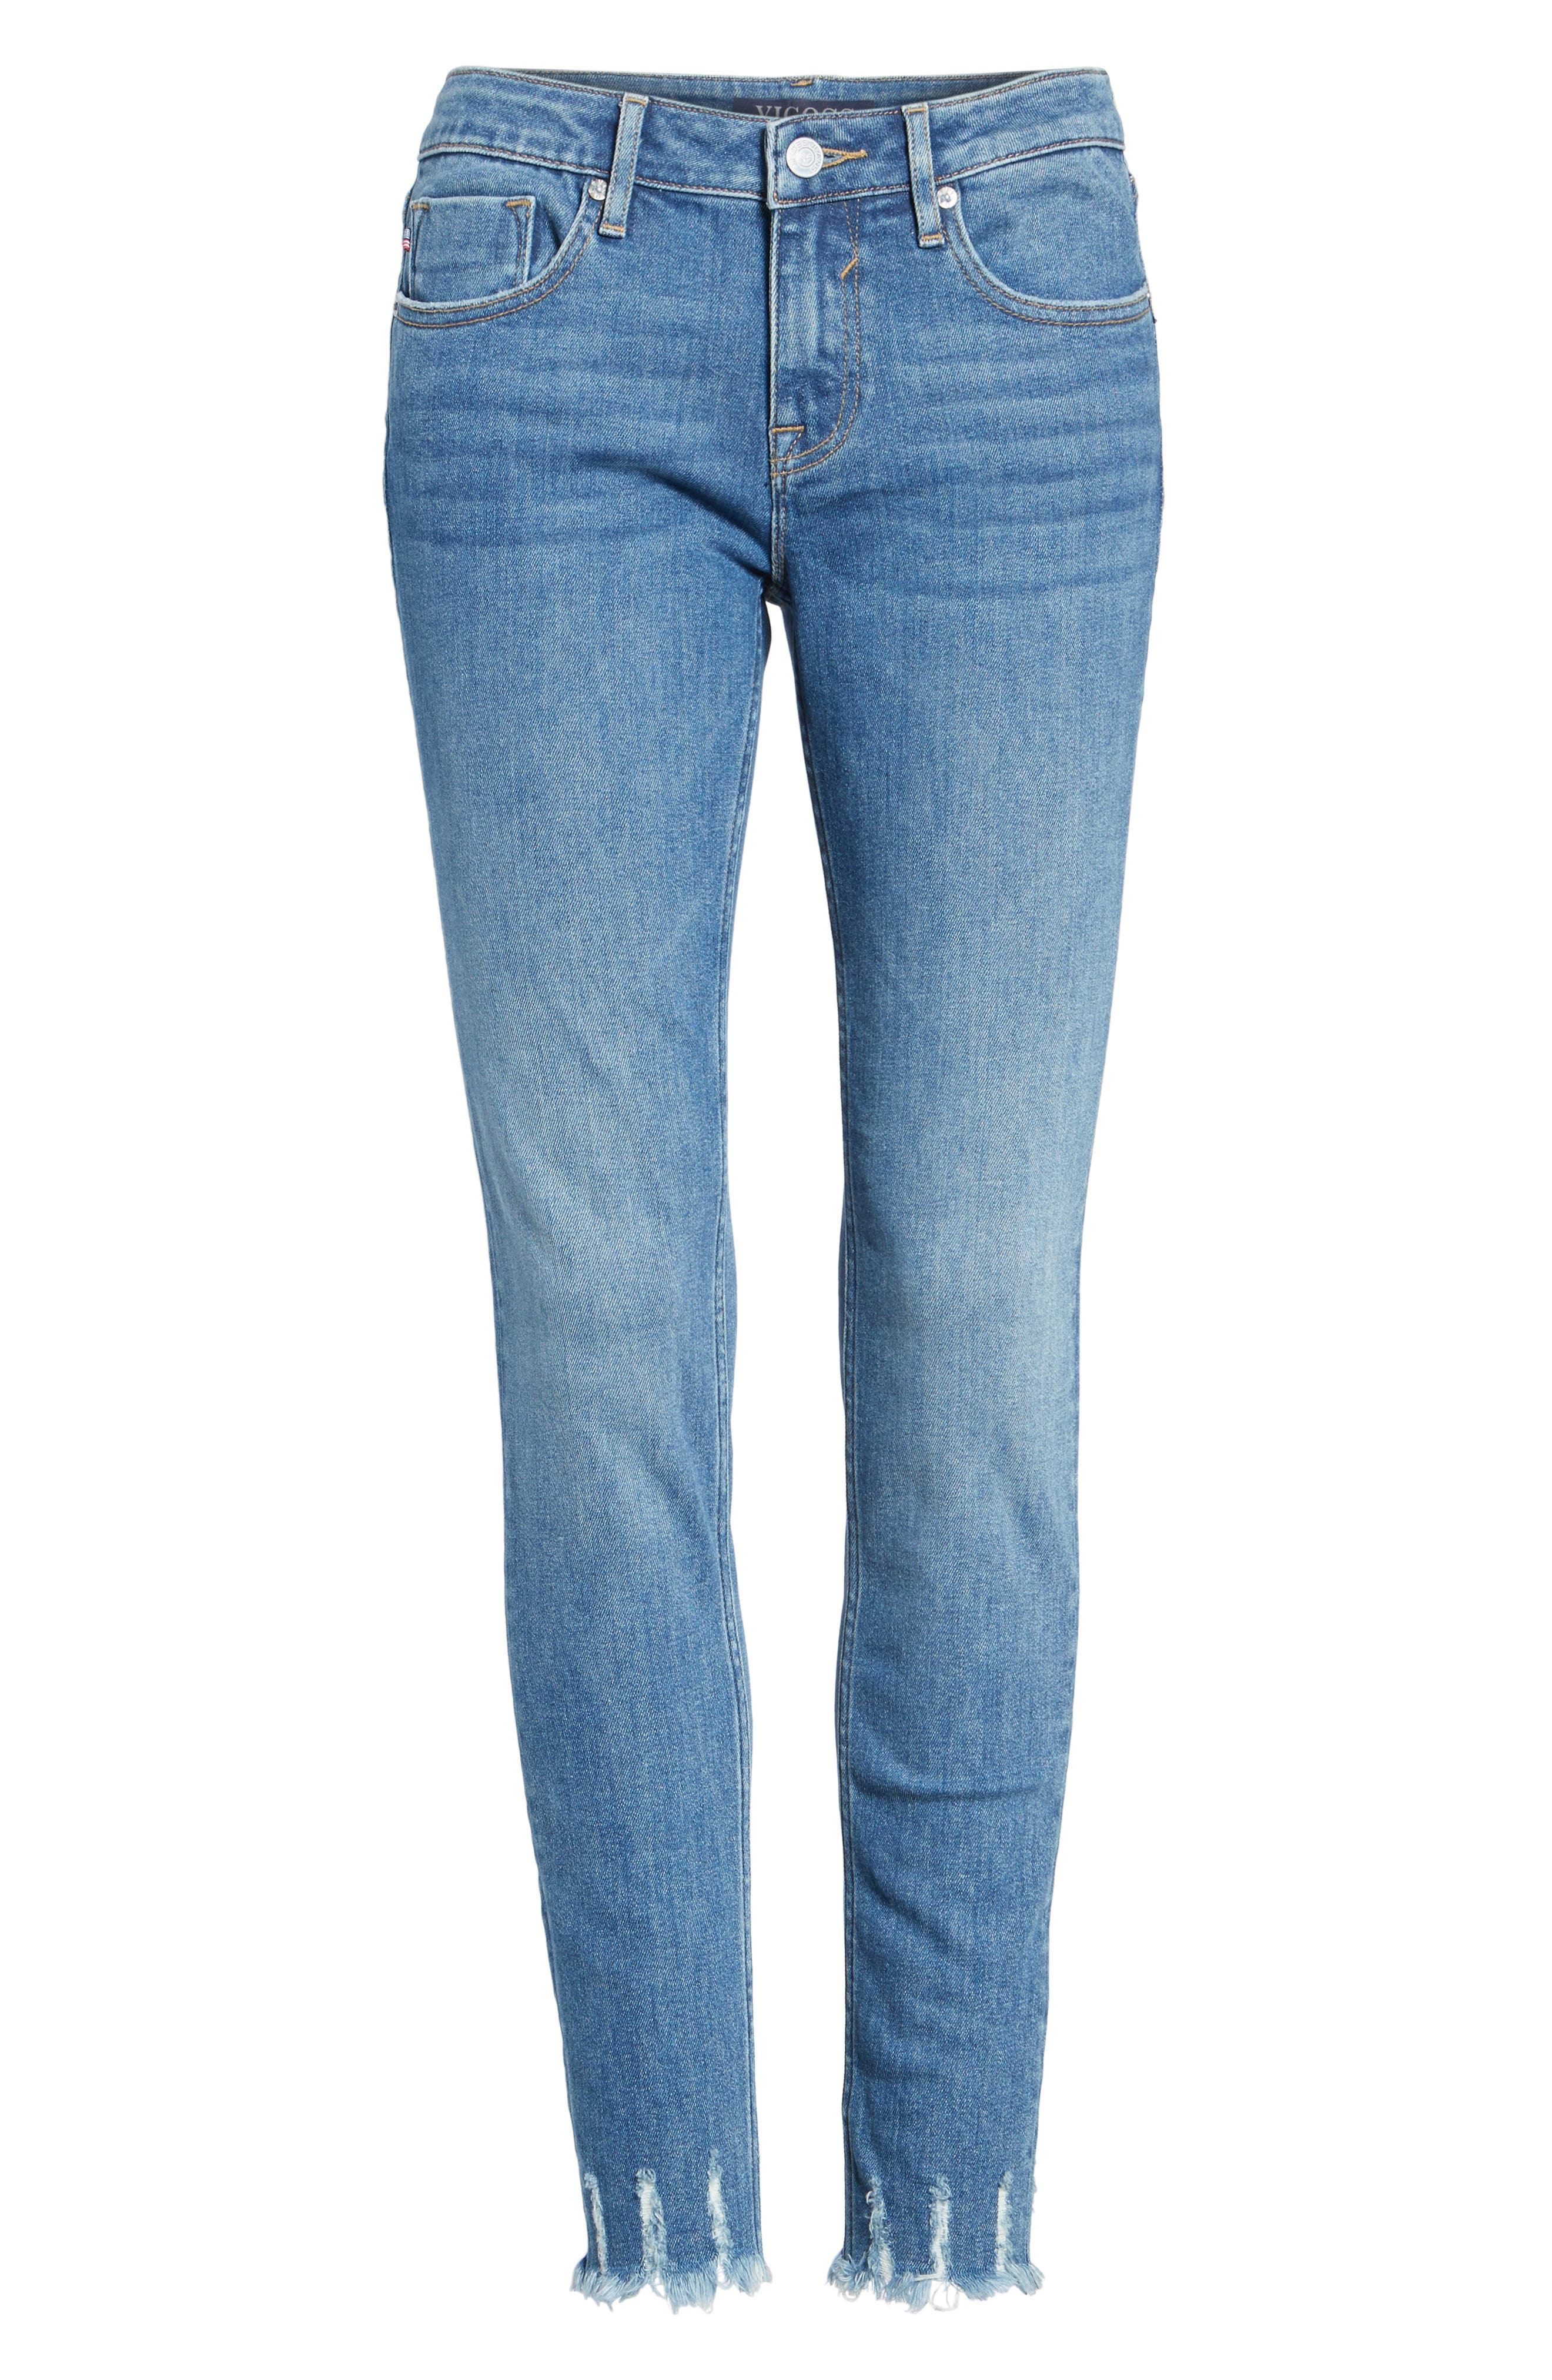 Jagger Skinny Jeans,                             Alternate thumbnail 6, color,